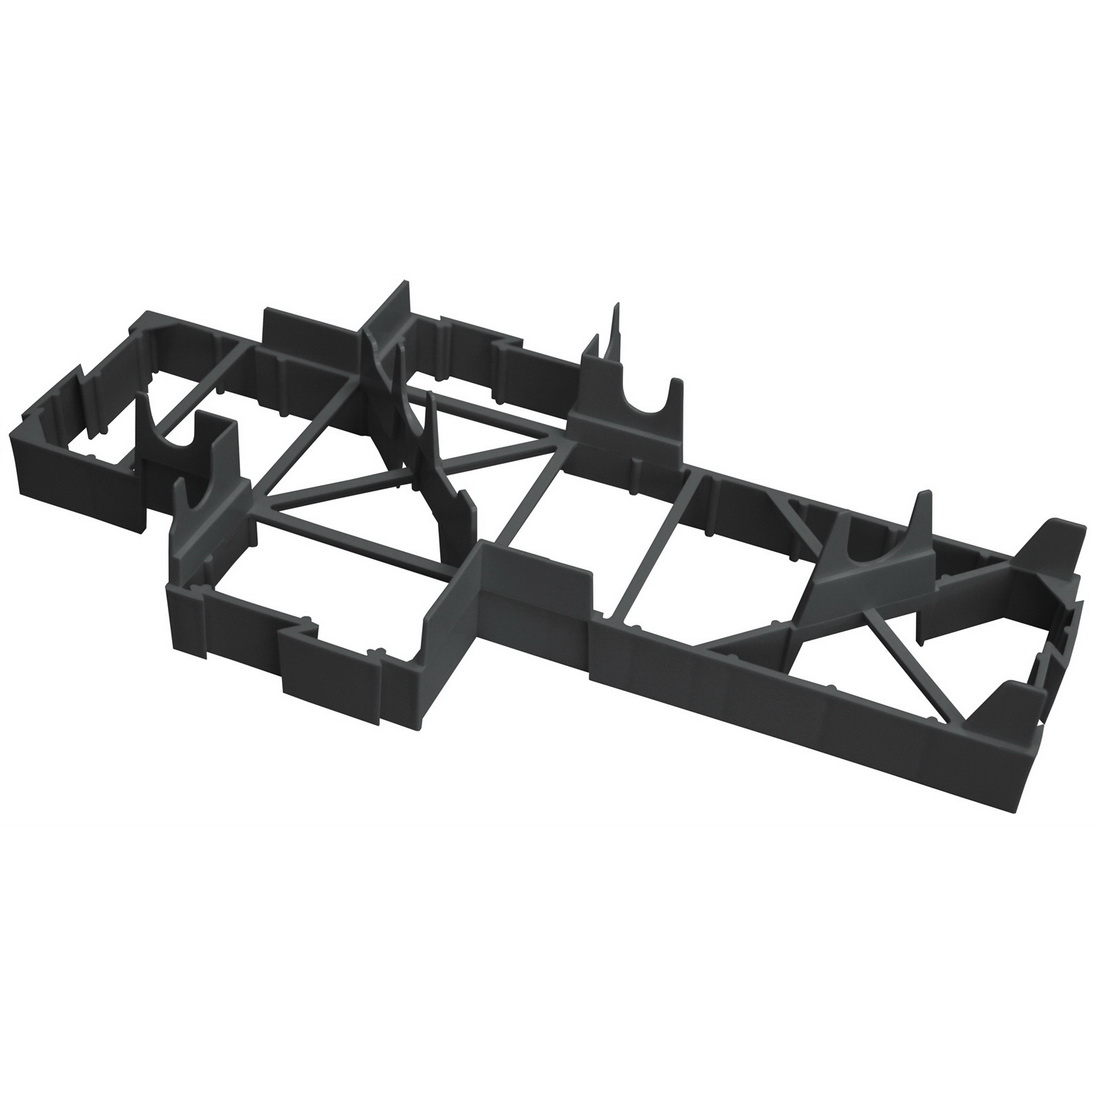 Expol Unimax Tuff Pod Spacer 50 x 200 x 400mm Black SPACERMAX